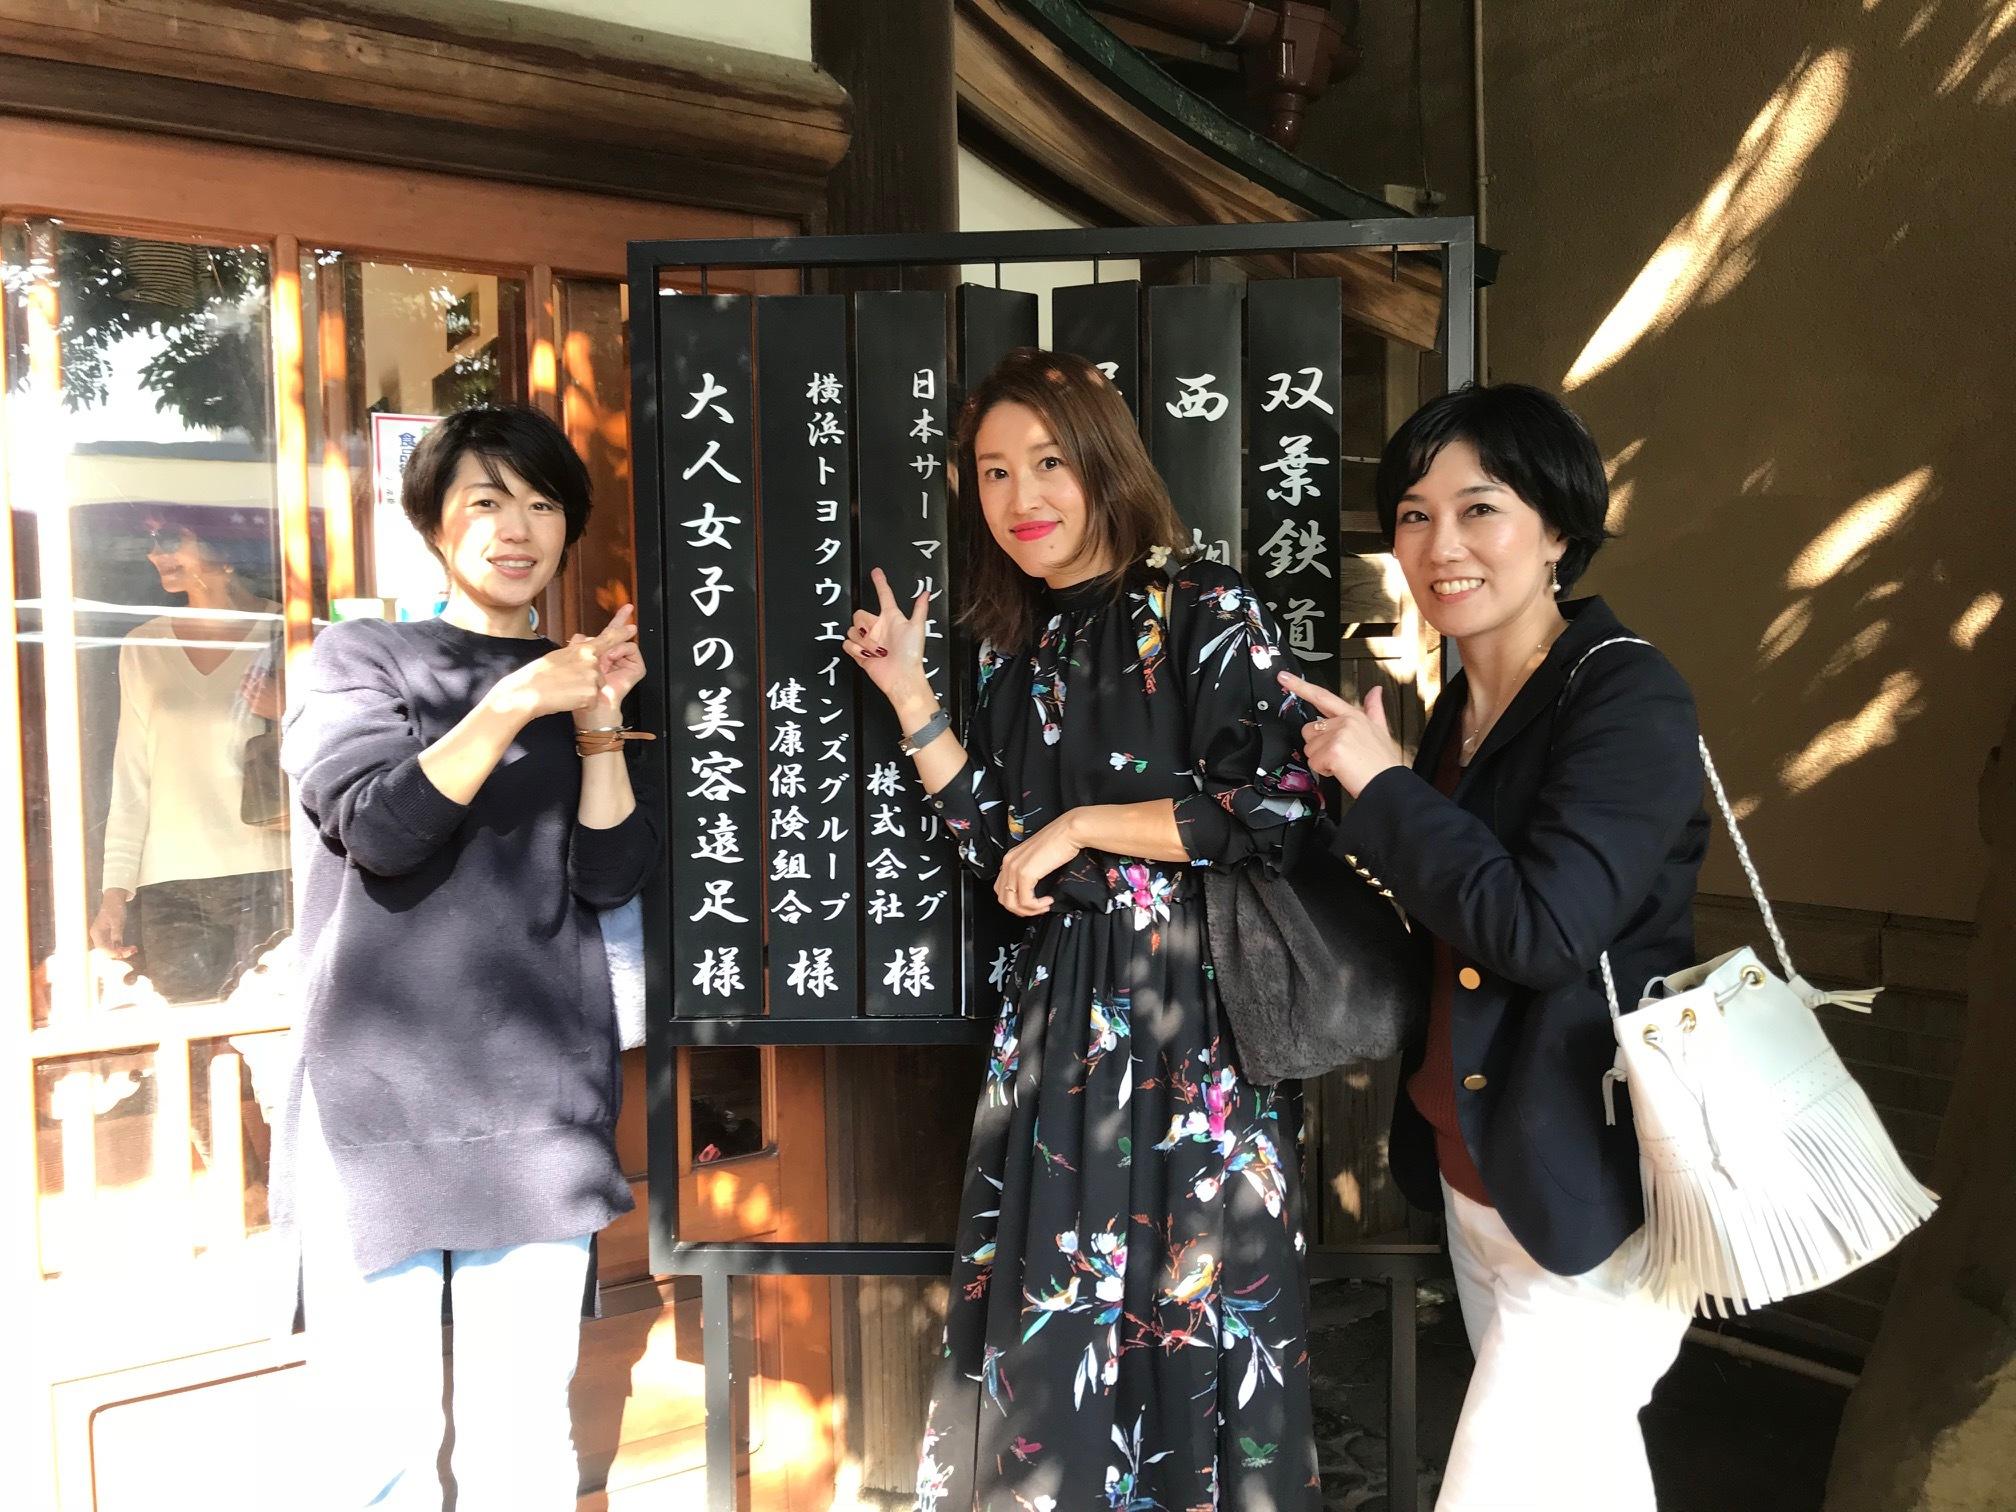 ASTALIFT with Marisol&eclat 大人女子の美容遠足~part.1~_1_2-2